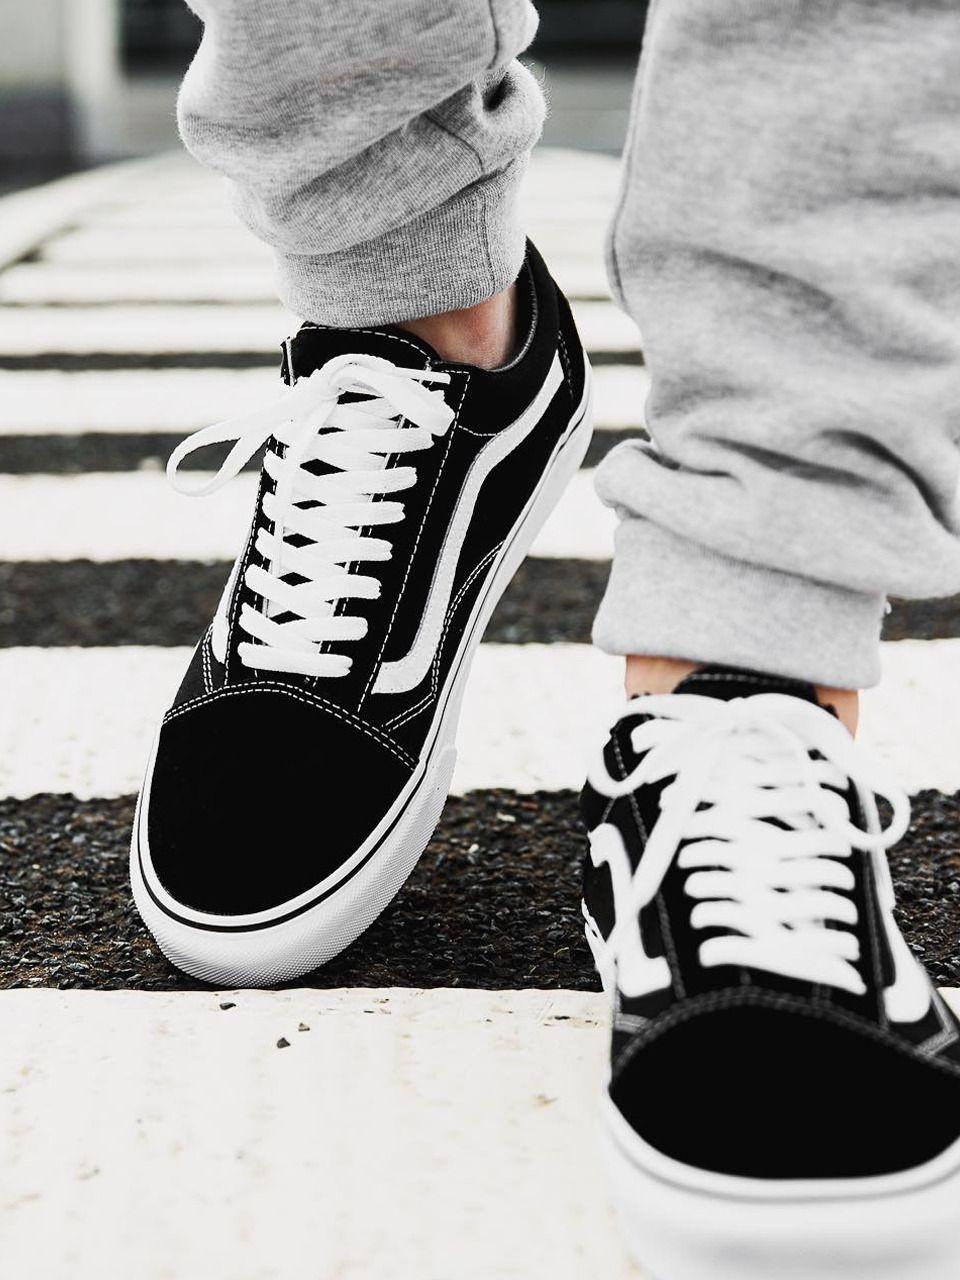 La Vans Old Skool 'Black White' https